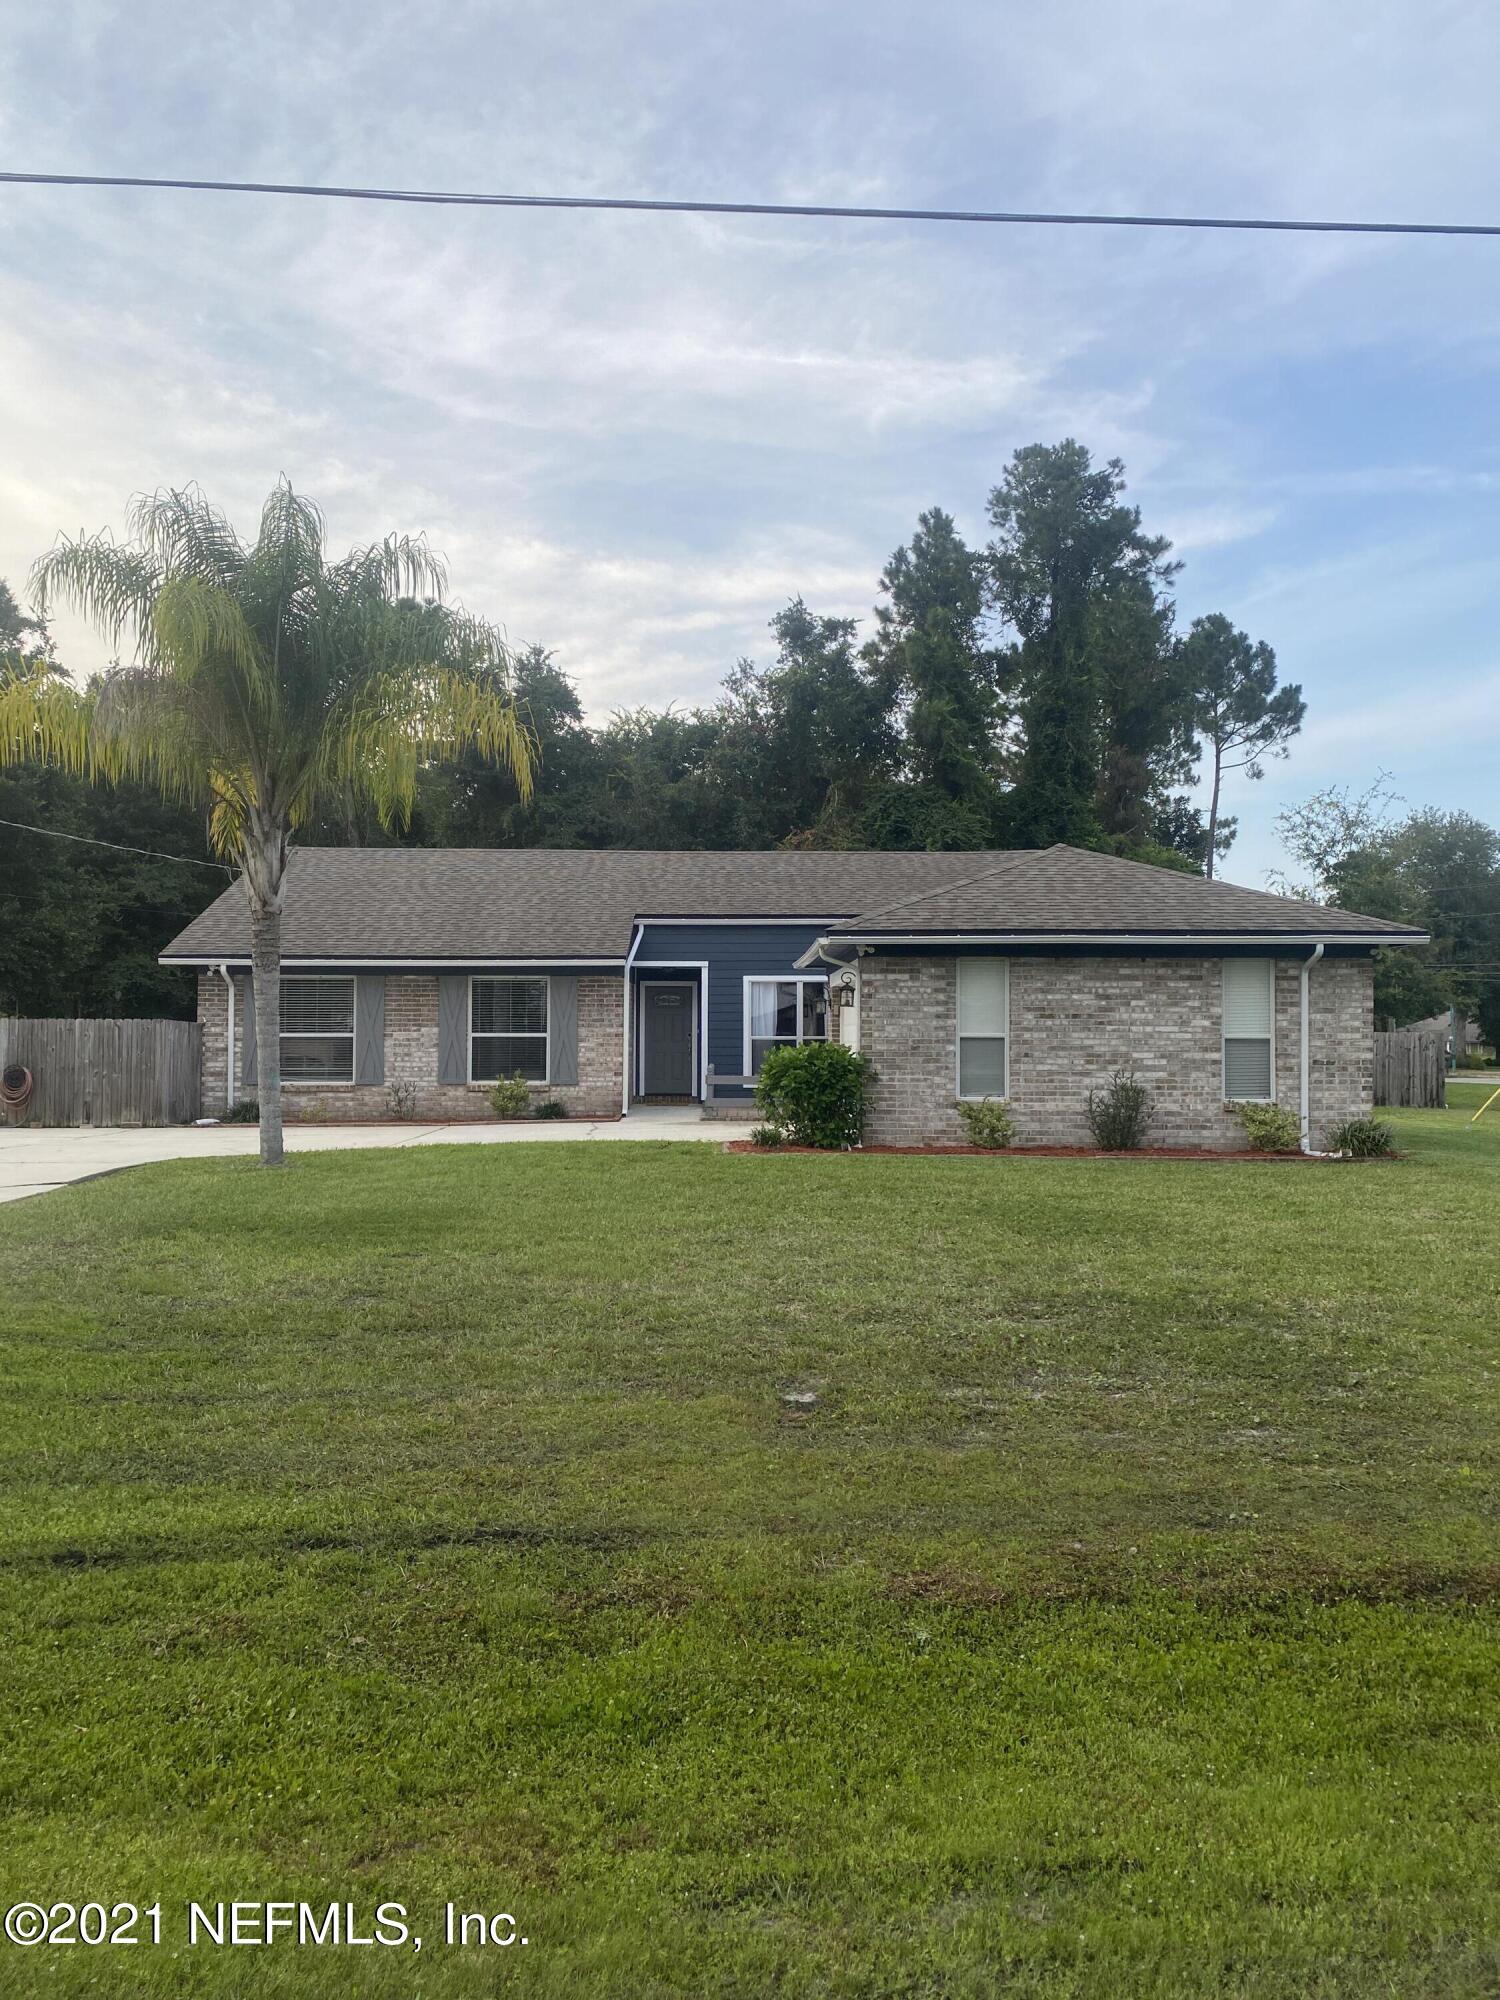 205 BLAKELEY, ORANGE PARK, FLORIDA 32003, 3 Bedrooms Bedrooms, ,2 BathroomsBathrooms,Residential,For sale,BLAKELEY,1123363